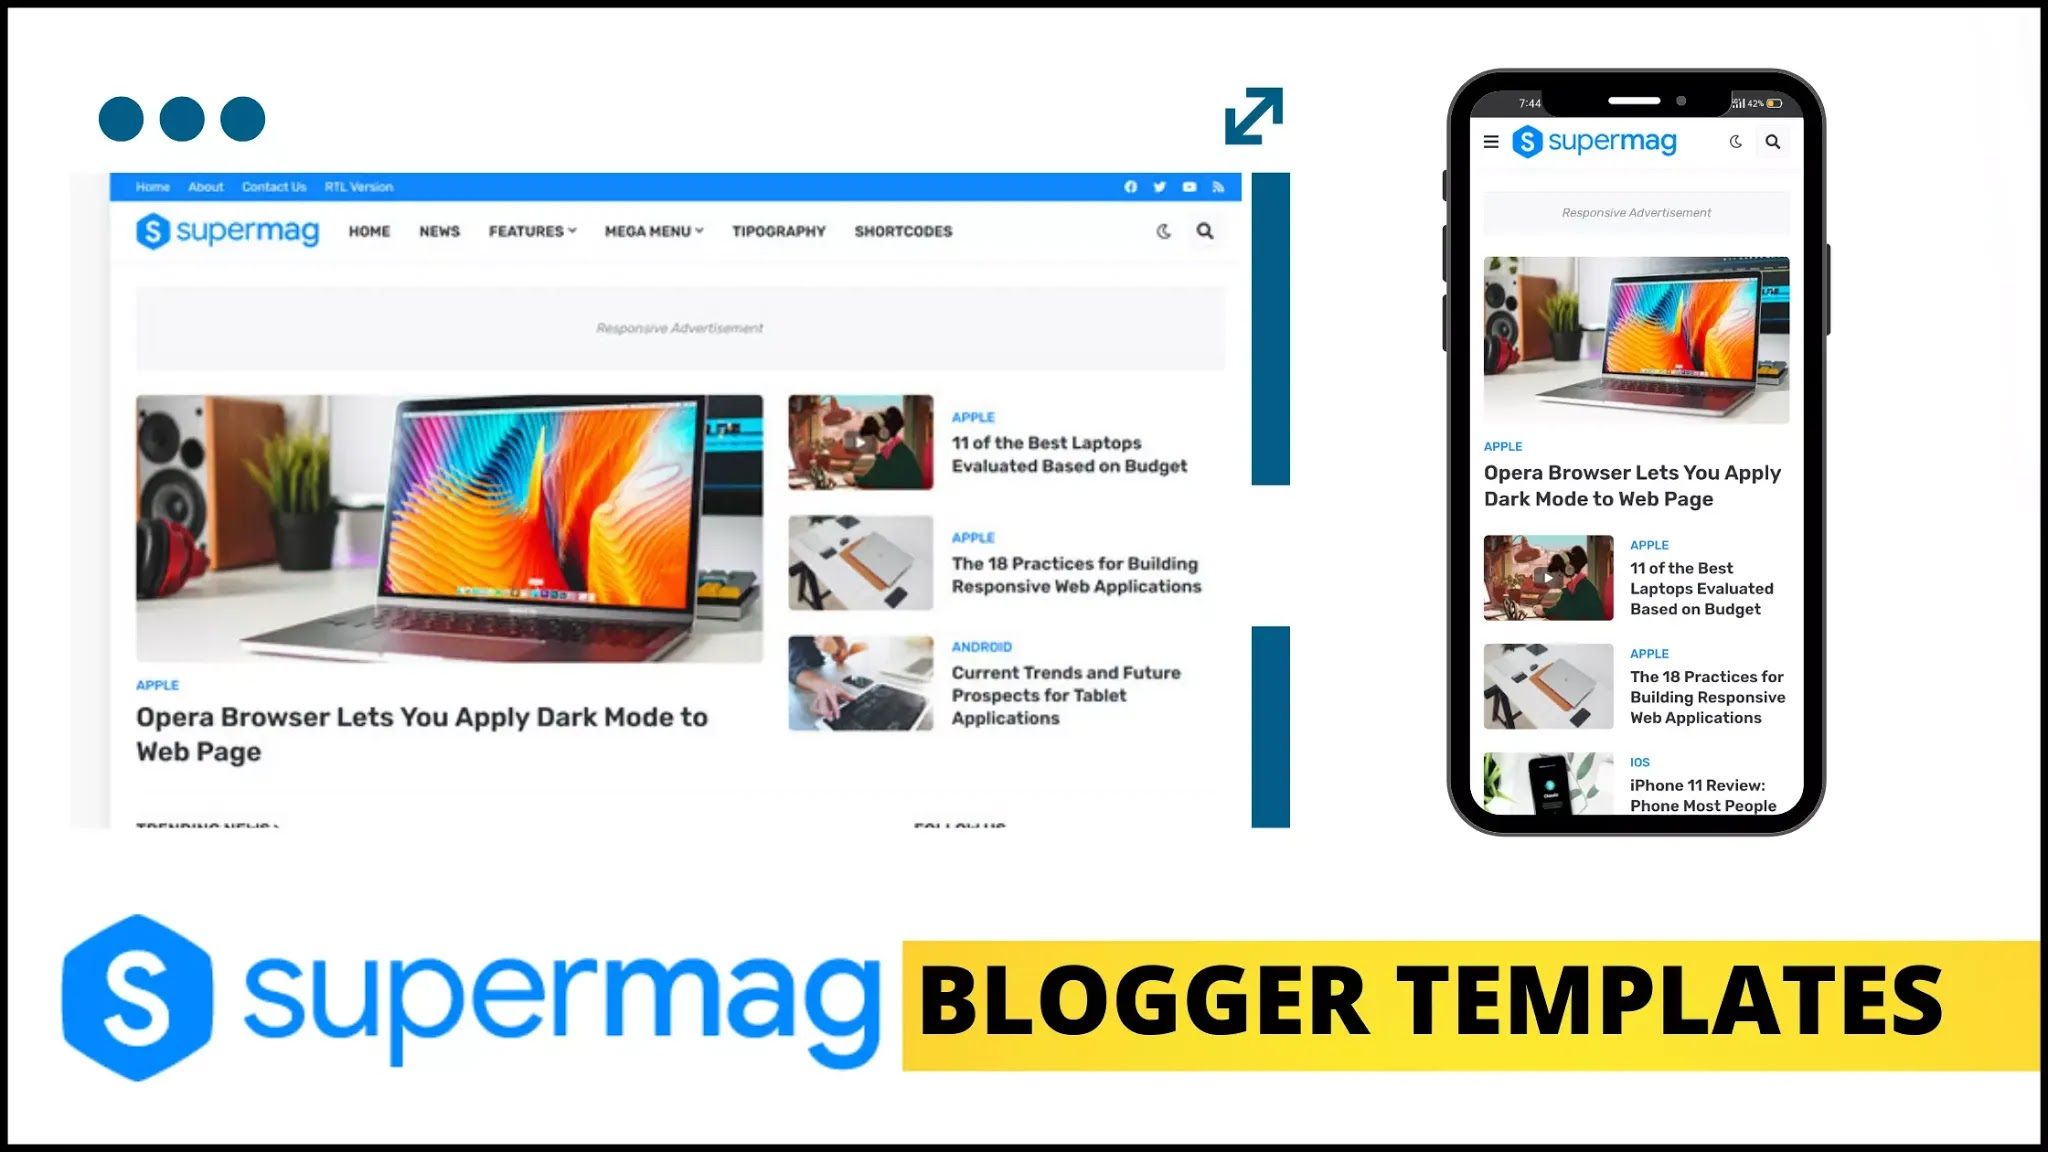 blog-website-templates, blogger-templates-html